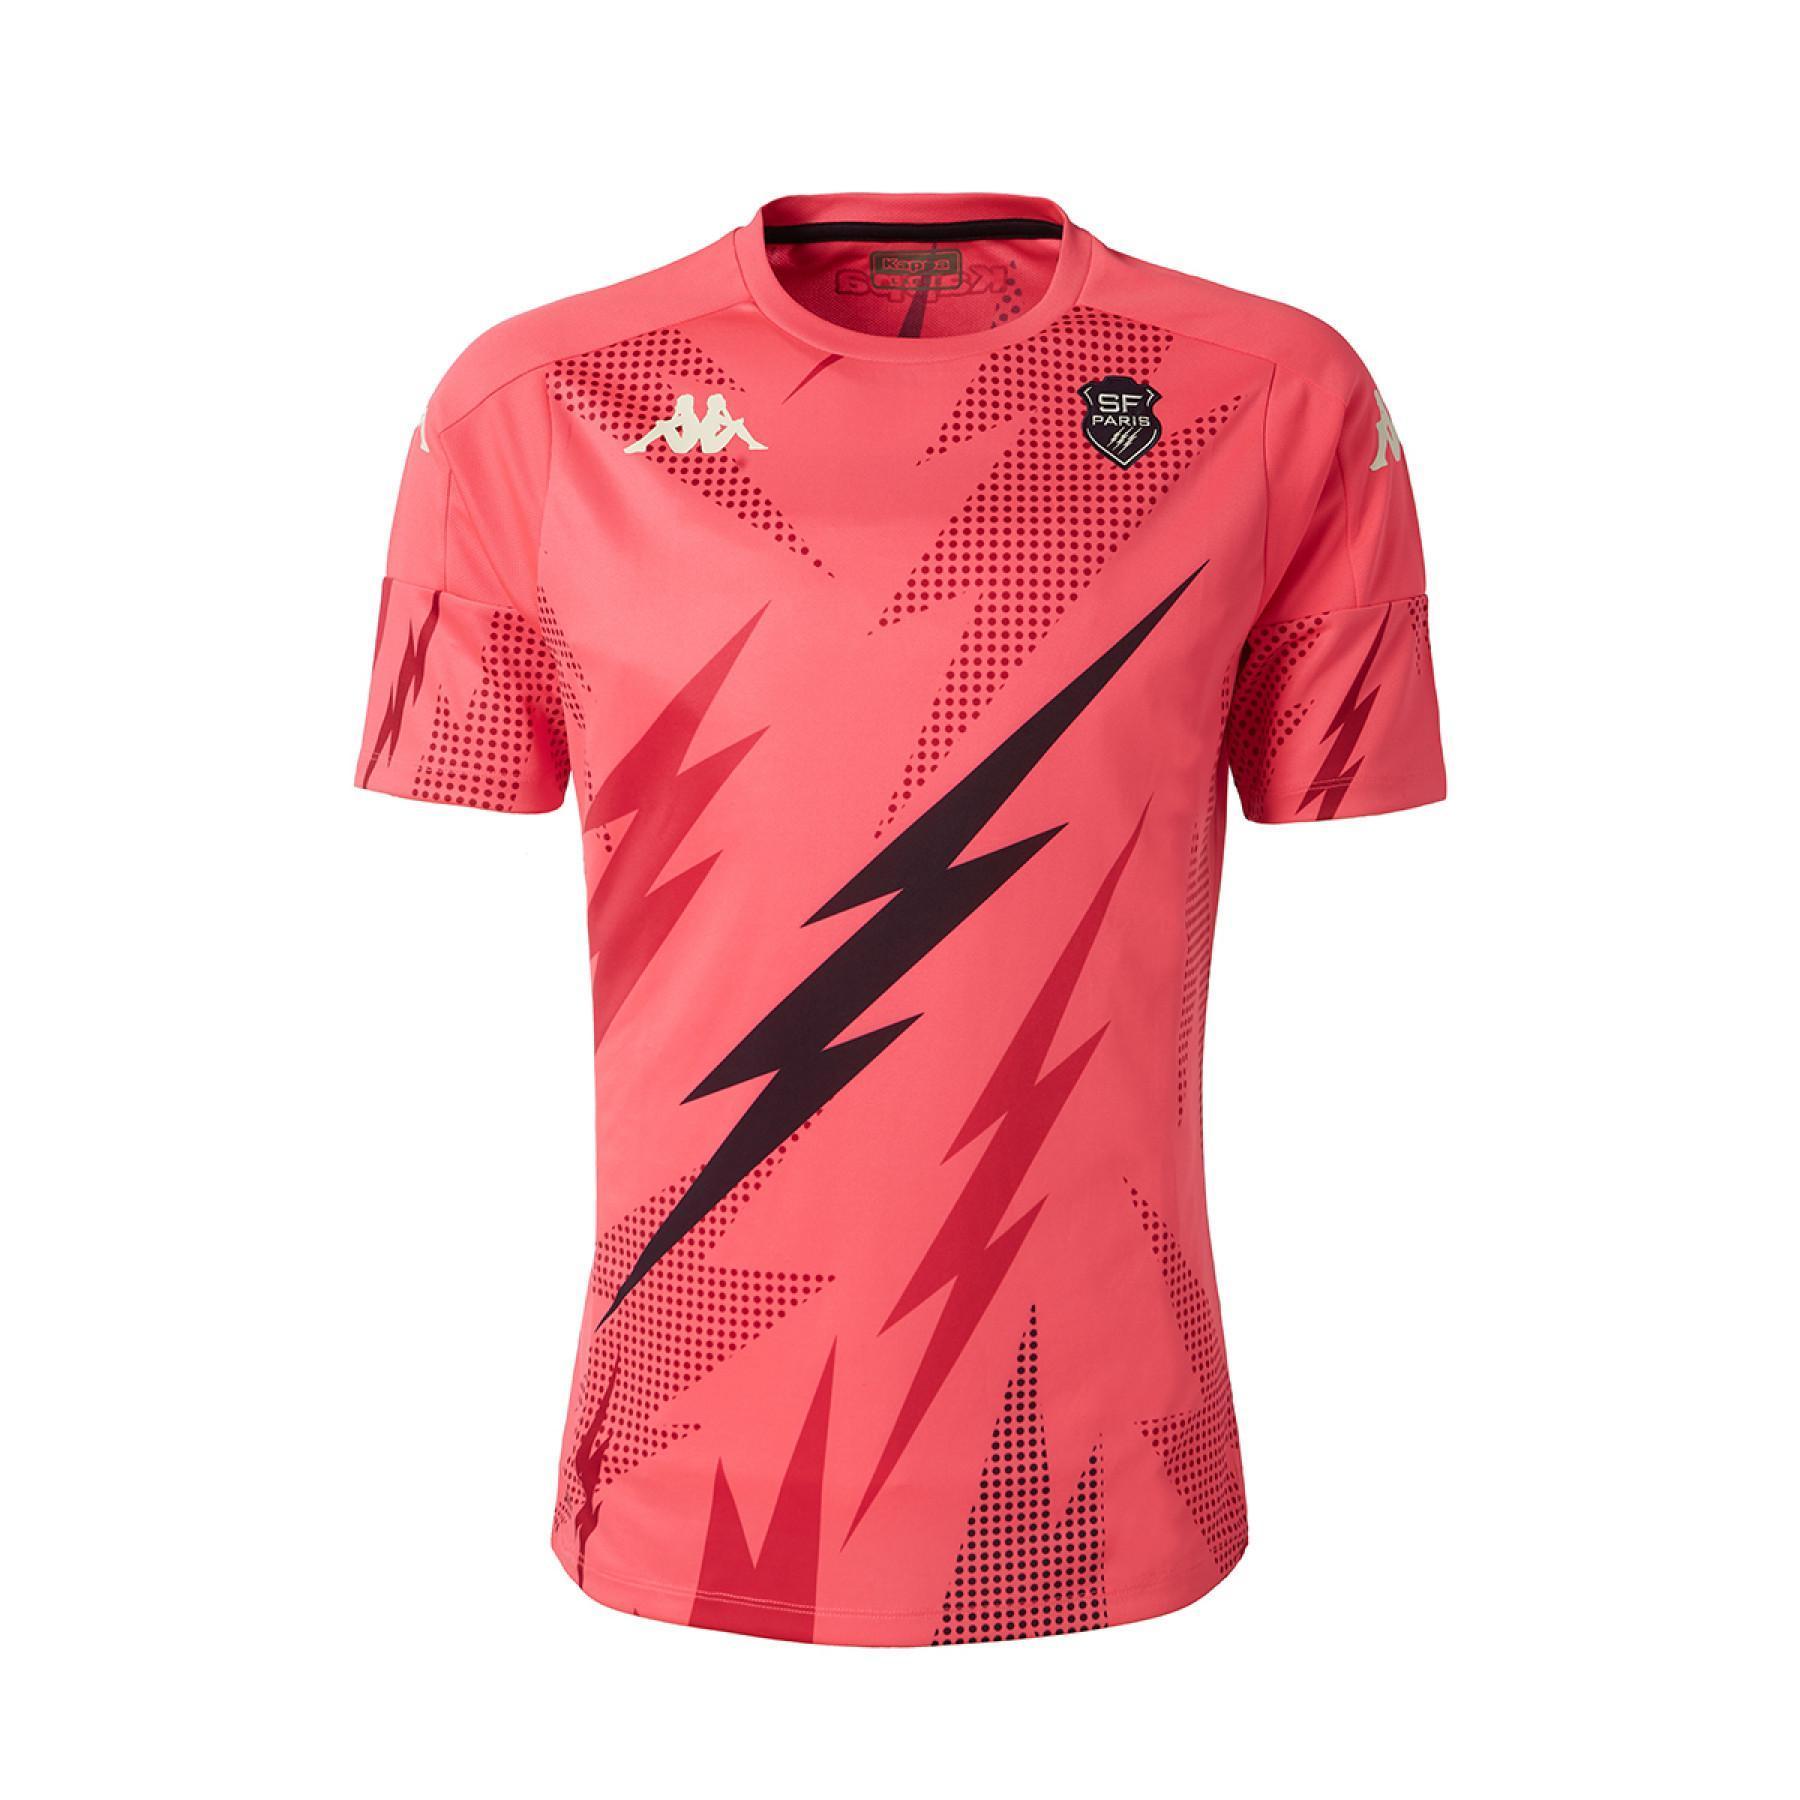 Warm-up T-shirt Stade Français 2020/21 aboupre pro 4